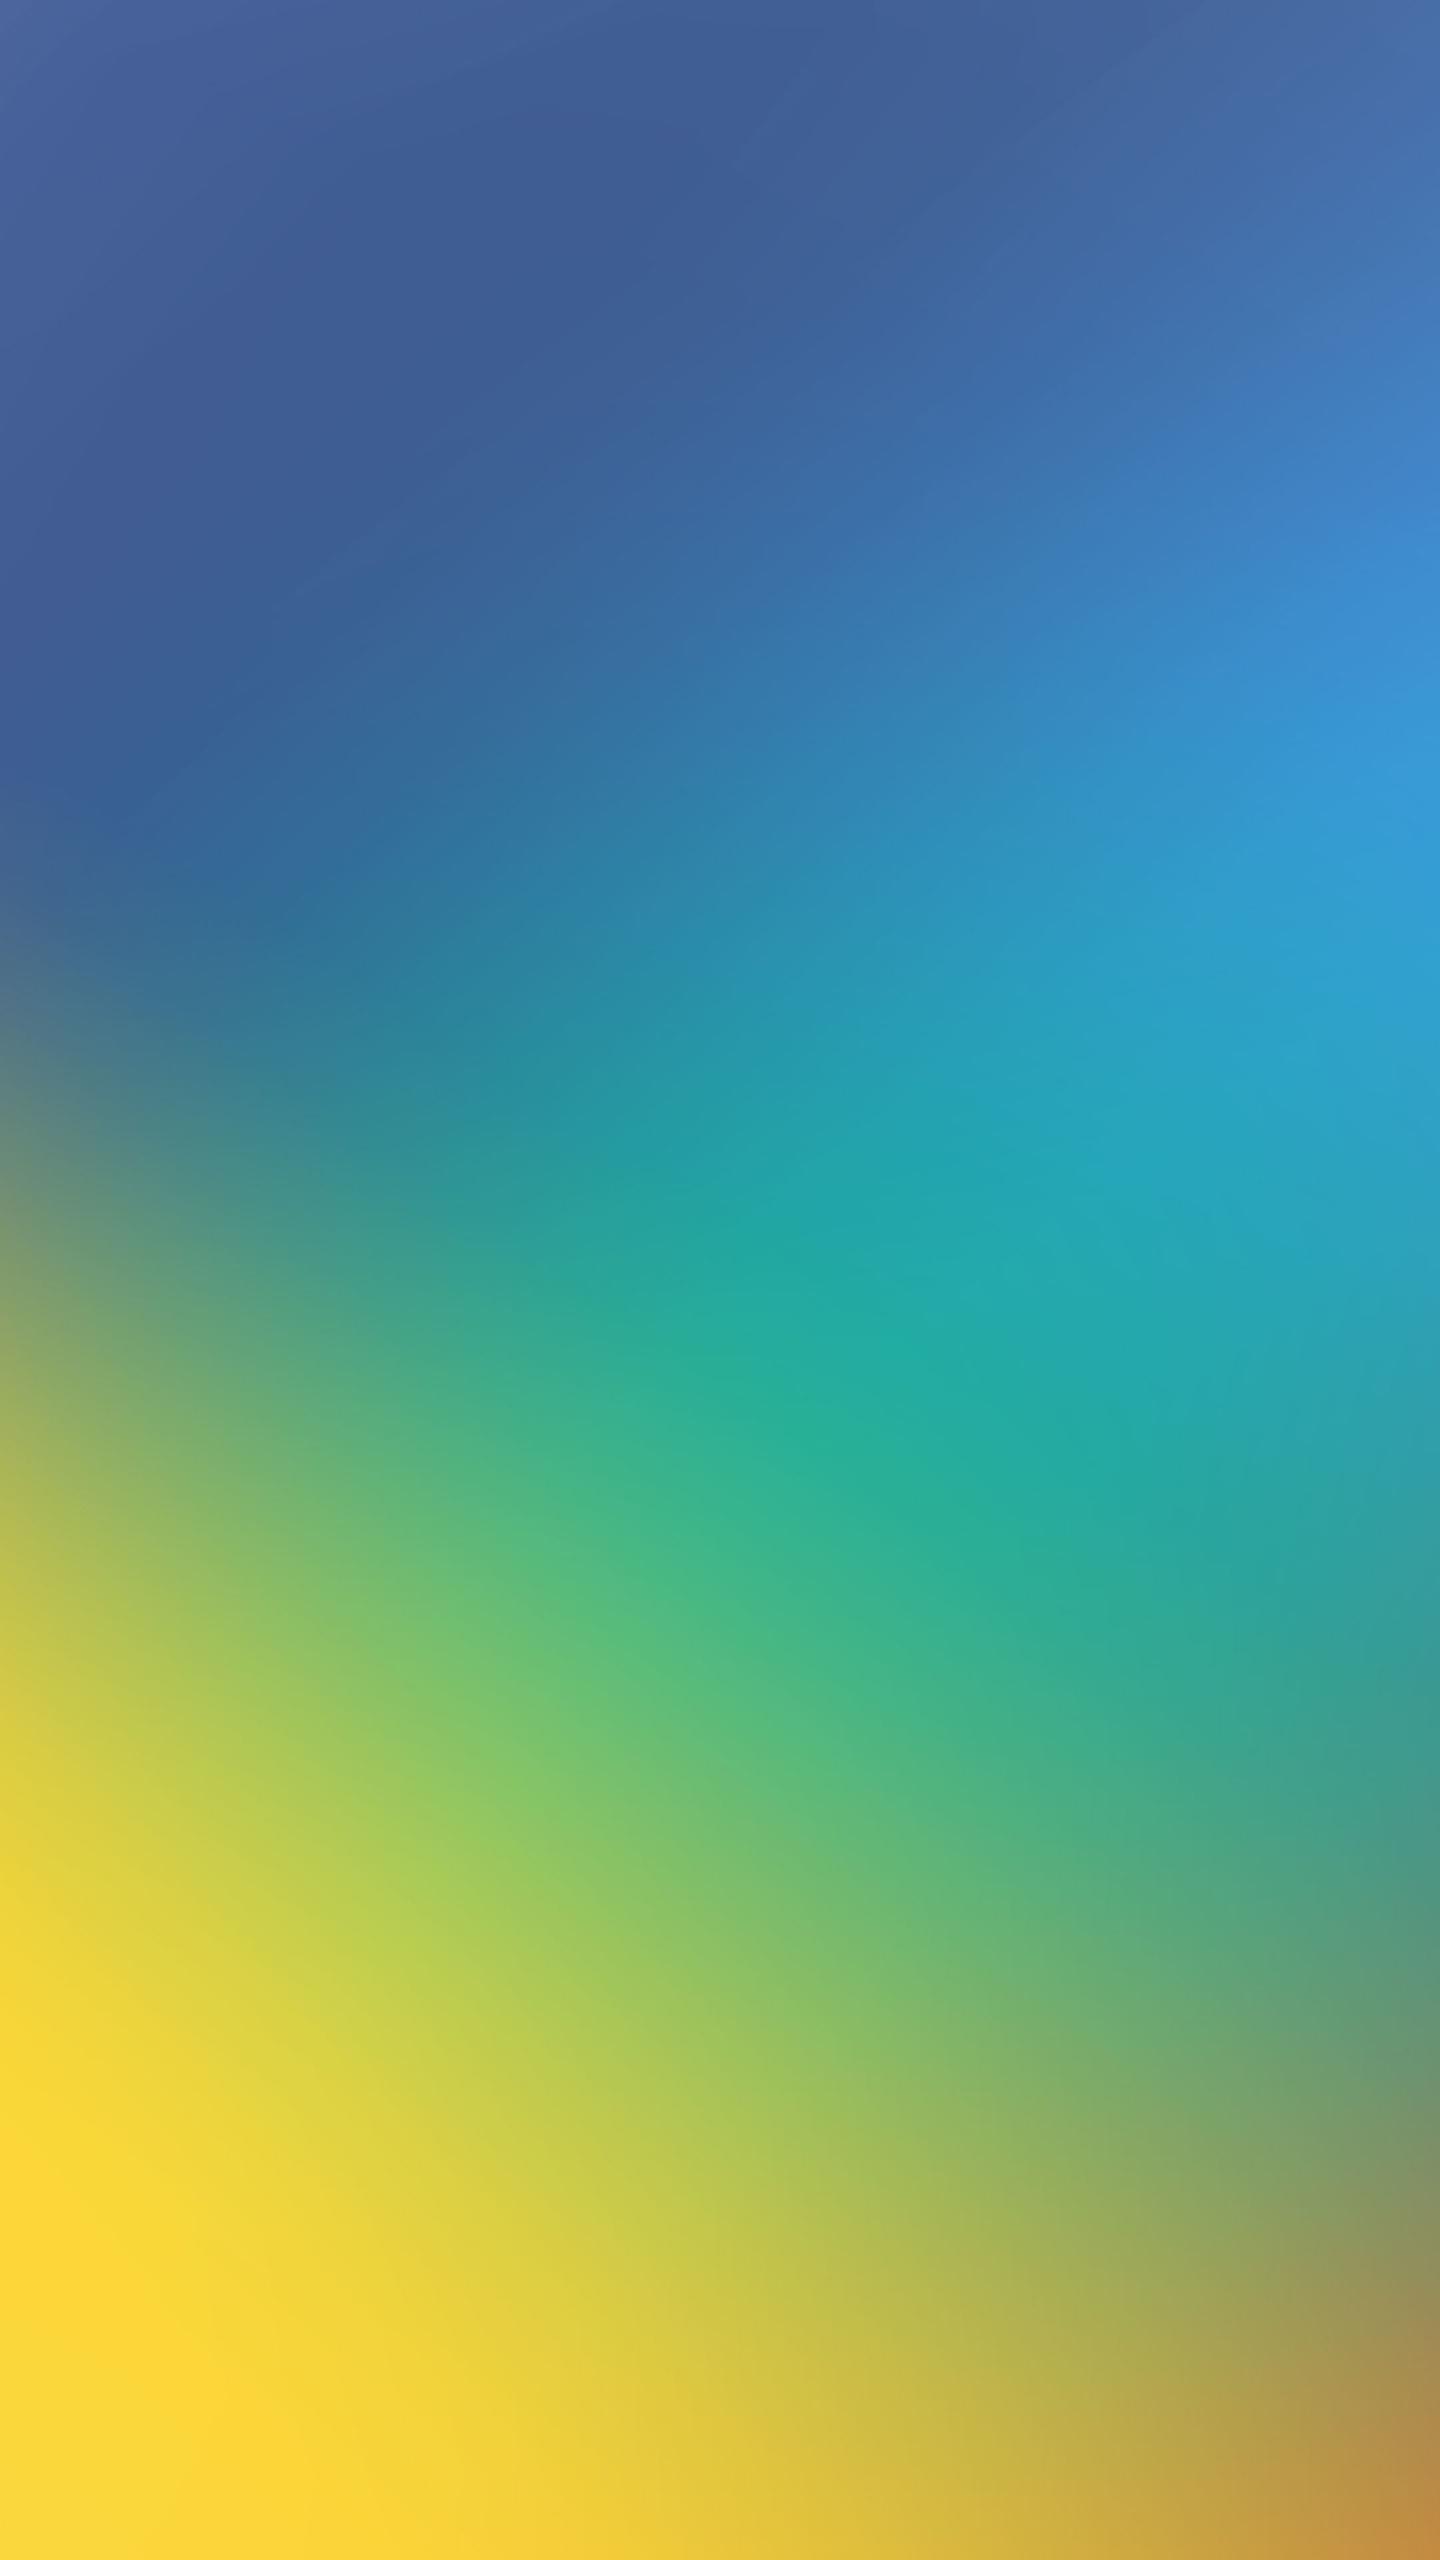 Samsung Galaxy S7 Wallpaper 4k Gradient Wallpaper 4k Phone 102509 Hd Wallpaper Backgrounds Download